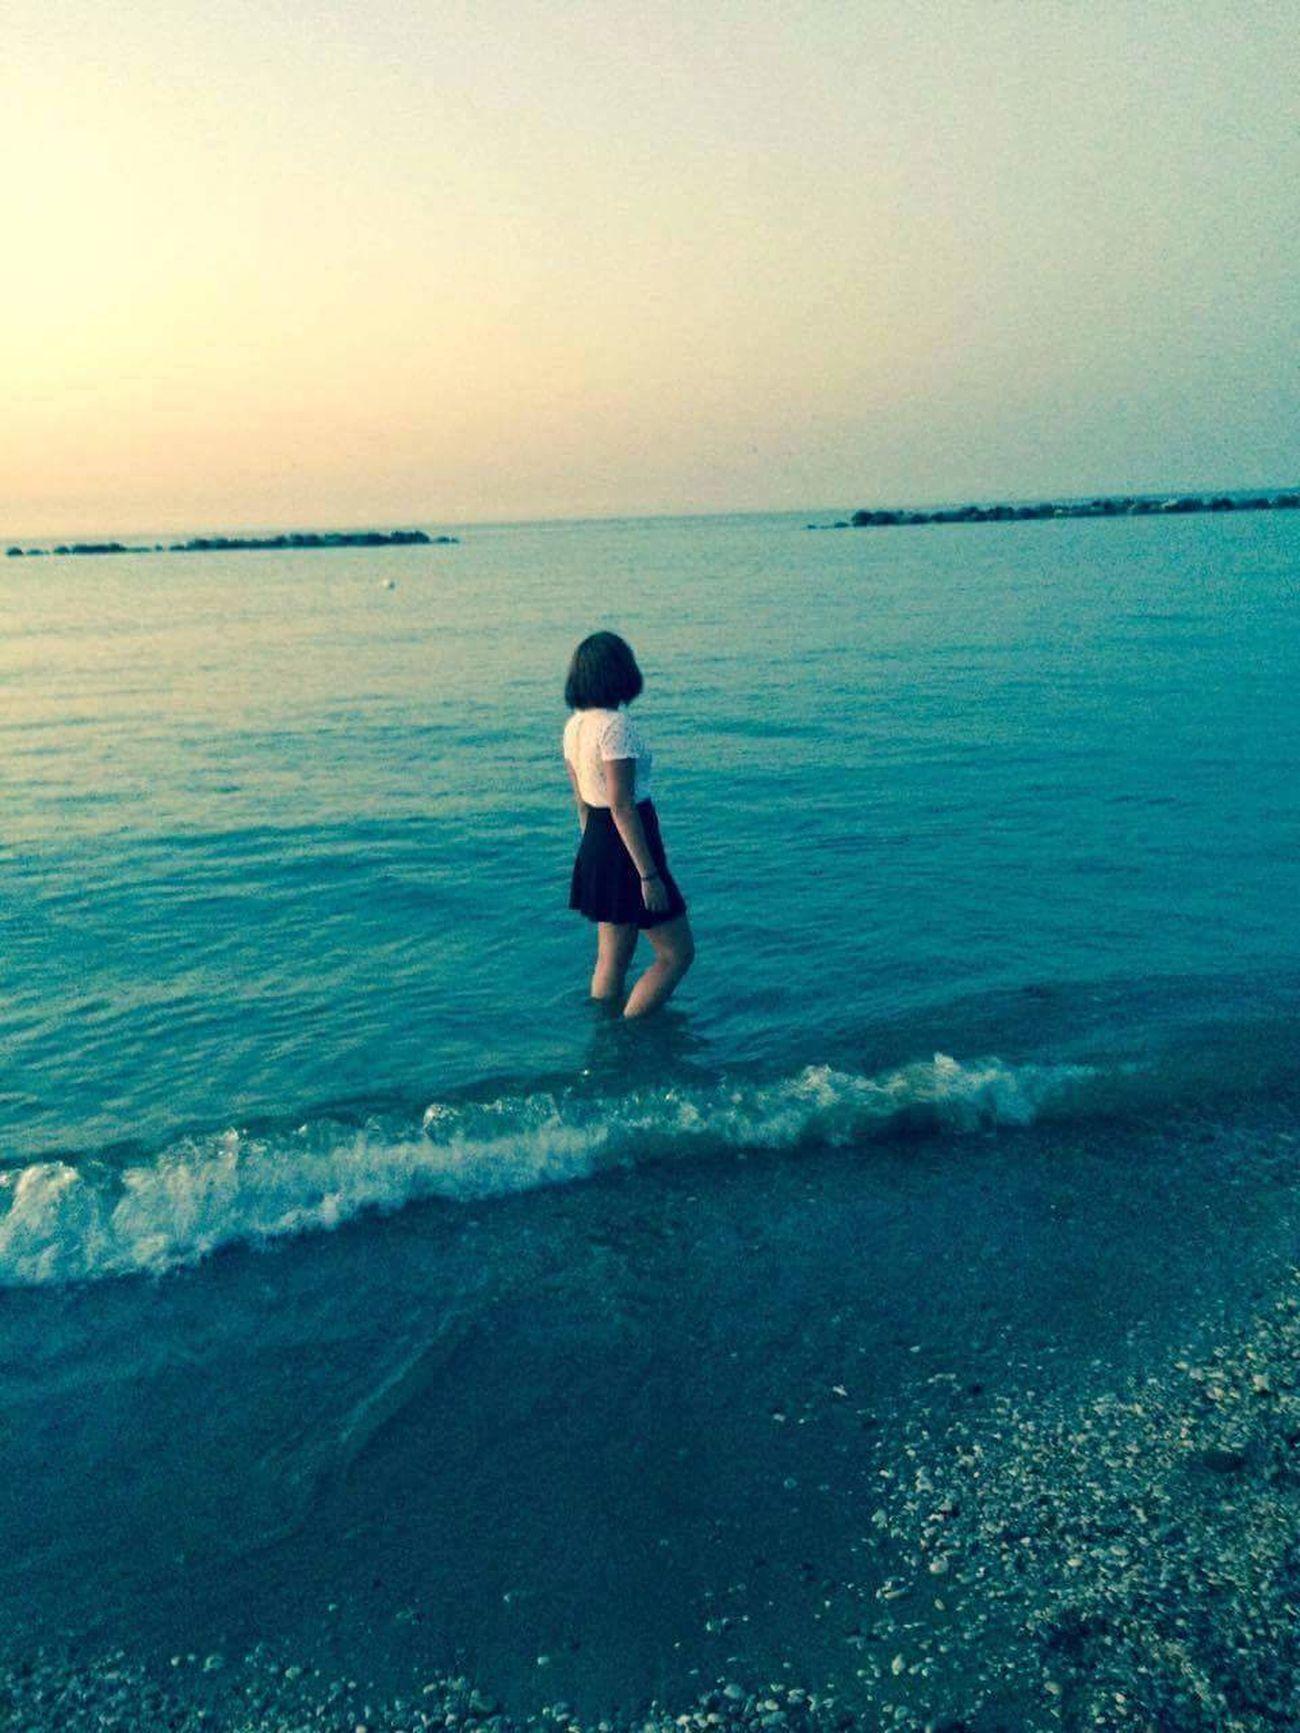 Fano Italia Czechgirlgirl Me Beach Likesforlikes Likeforlike Likeback Likemeplease